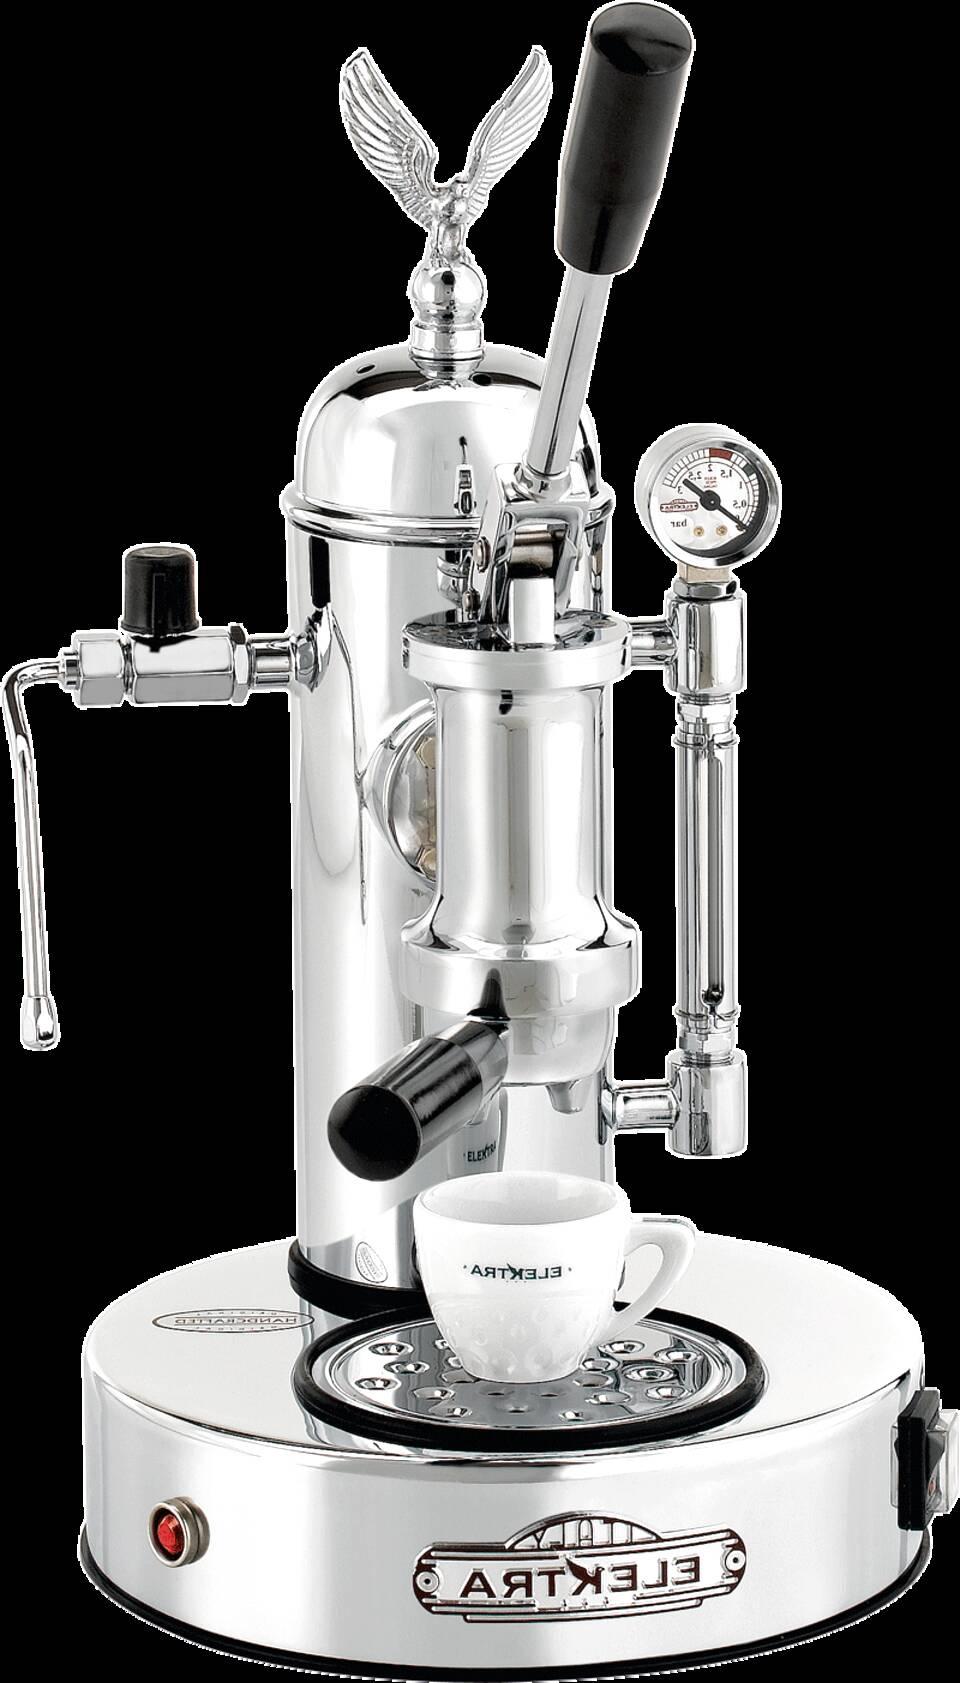 Lever Espresso Machine For Sale In Uk View 59 Bargains